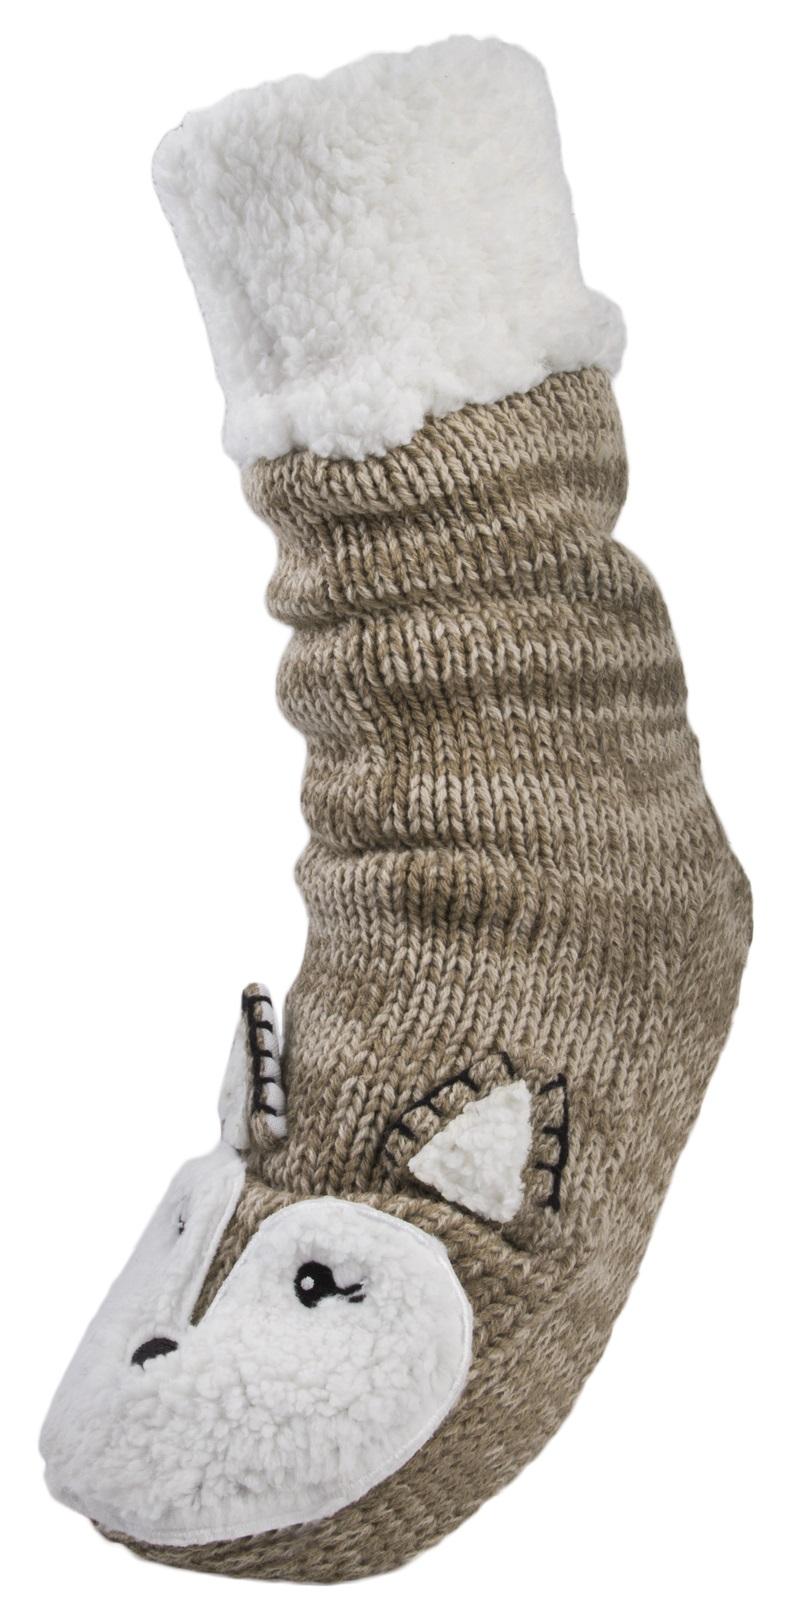 Womens Reindeer Knitted Boots Slipper Socks Ankle Booties Ladies Girls Size 3-8 | EBay